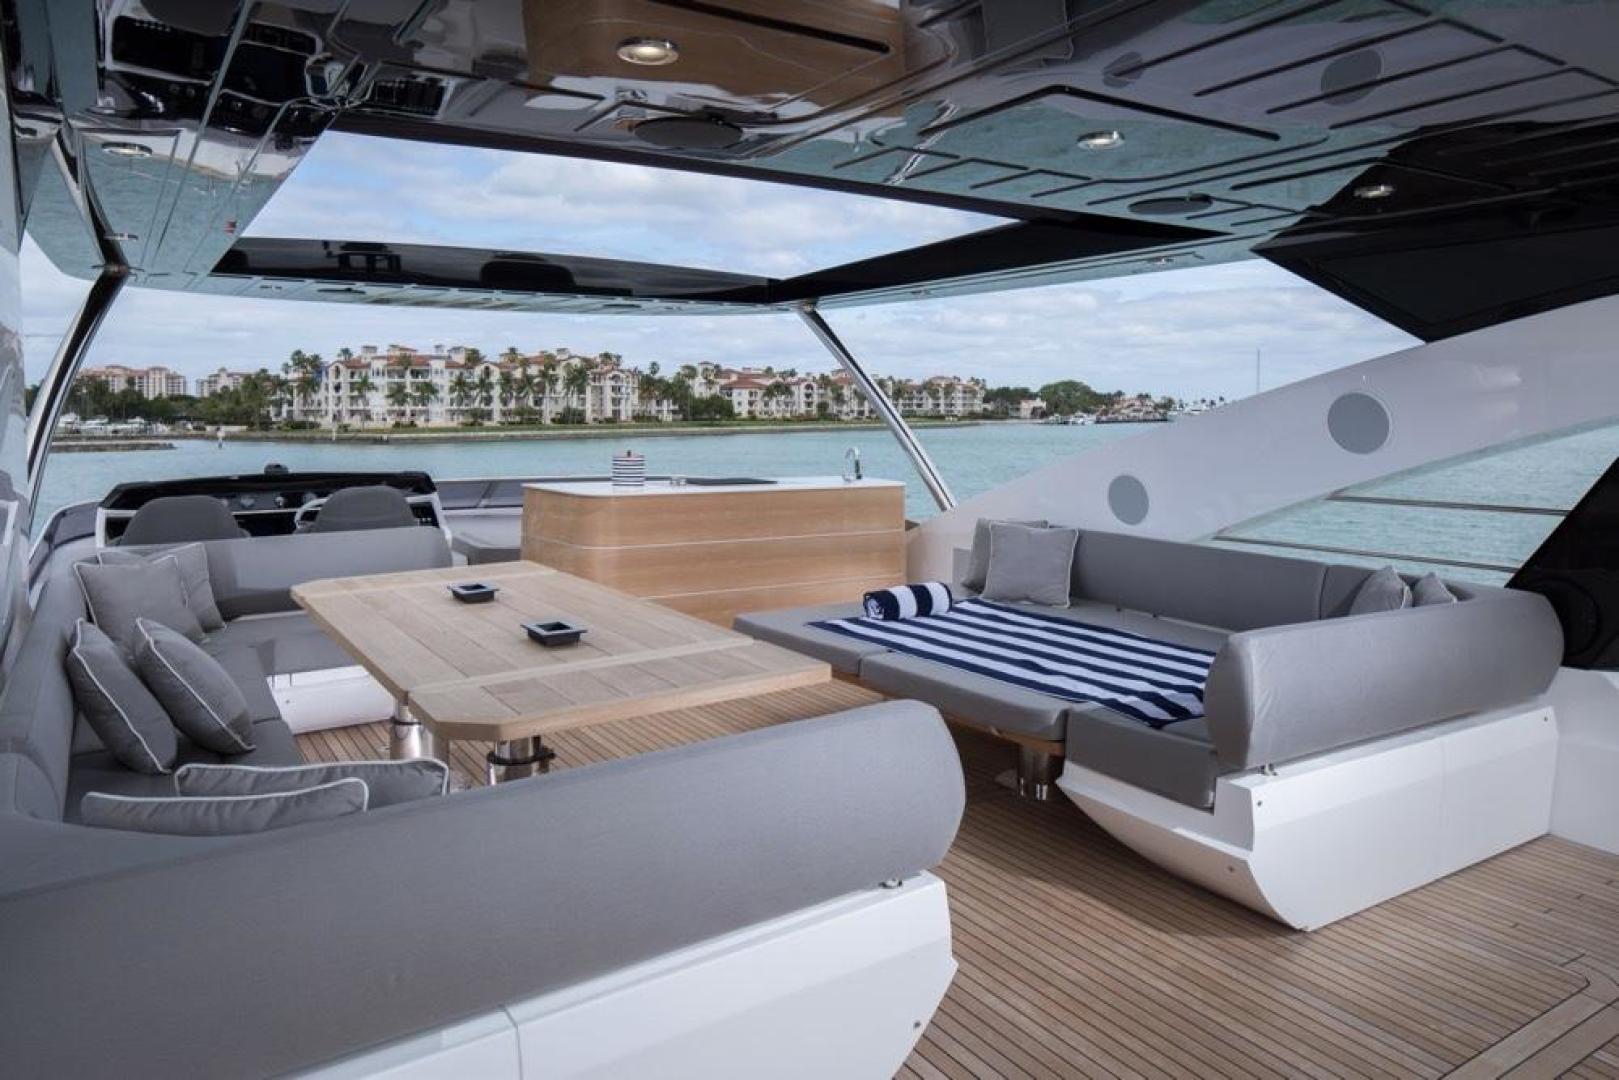 Sunseeker-28 Metre Yacht 2016-RIII Miami-Florida-United States-600122 | Thumbnail